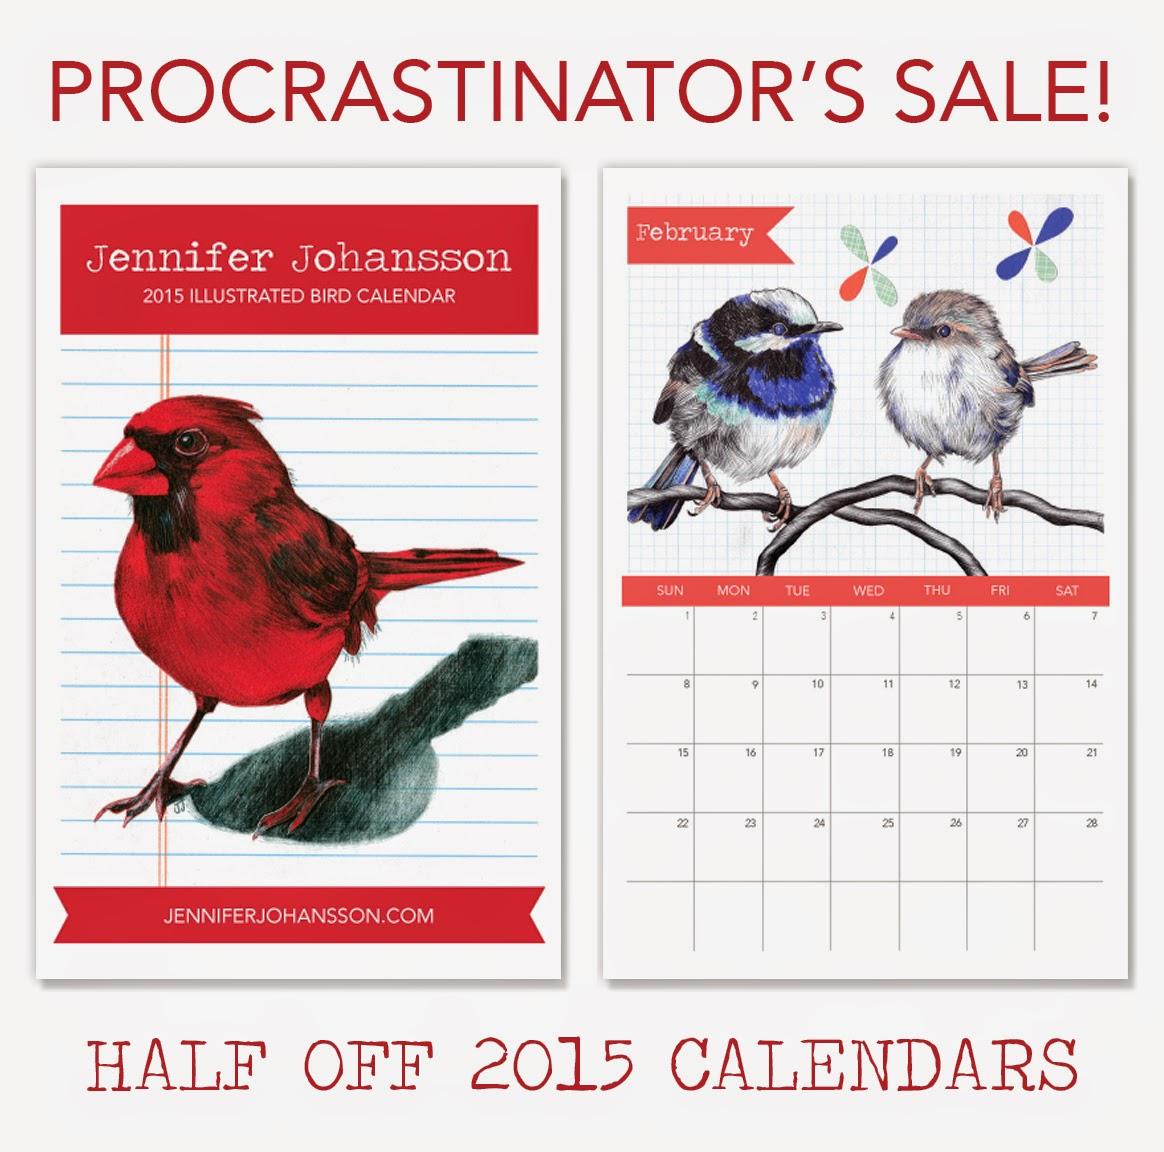 Half Off 2015 Bird Calendars - jenniferjohansson.etsy.com